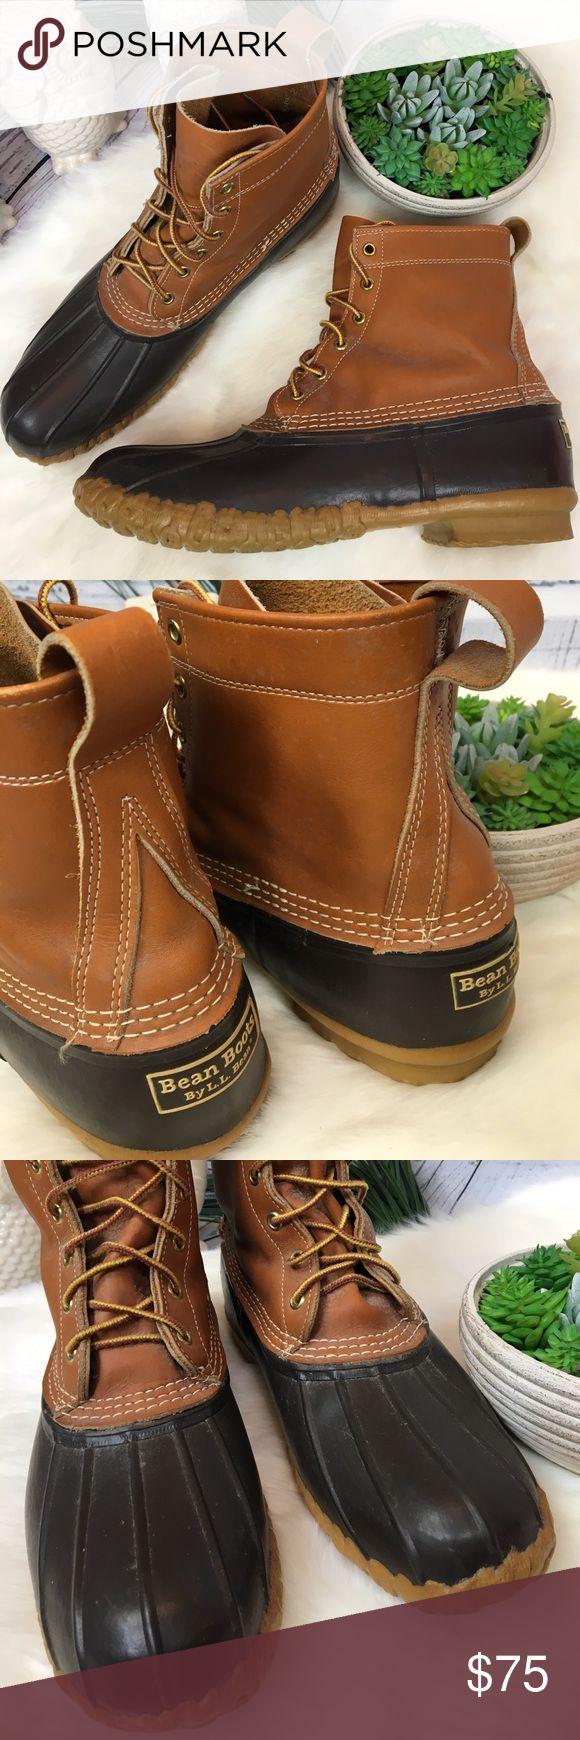 L l bean order form - Ll Bean Brown Bean Duck Boots Men S Sz 11 Usa Awesome Boots L L Bean